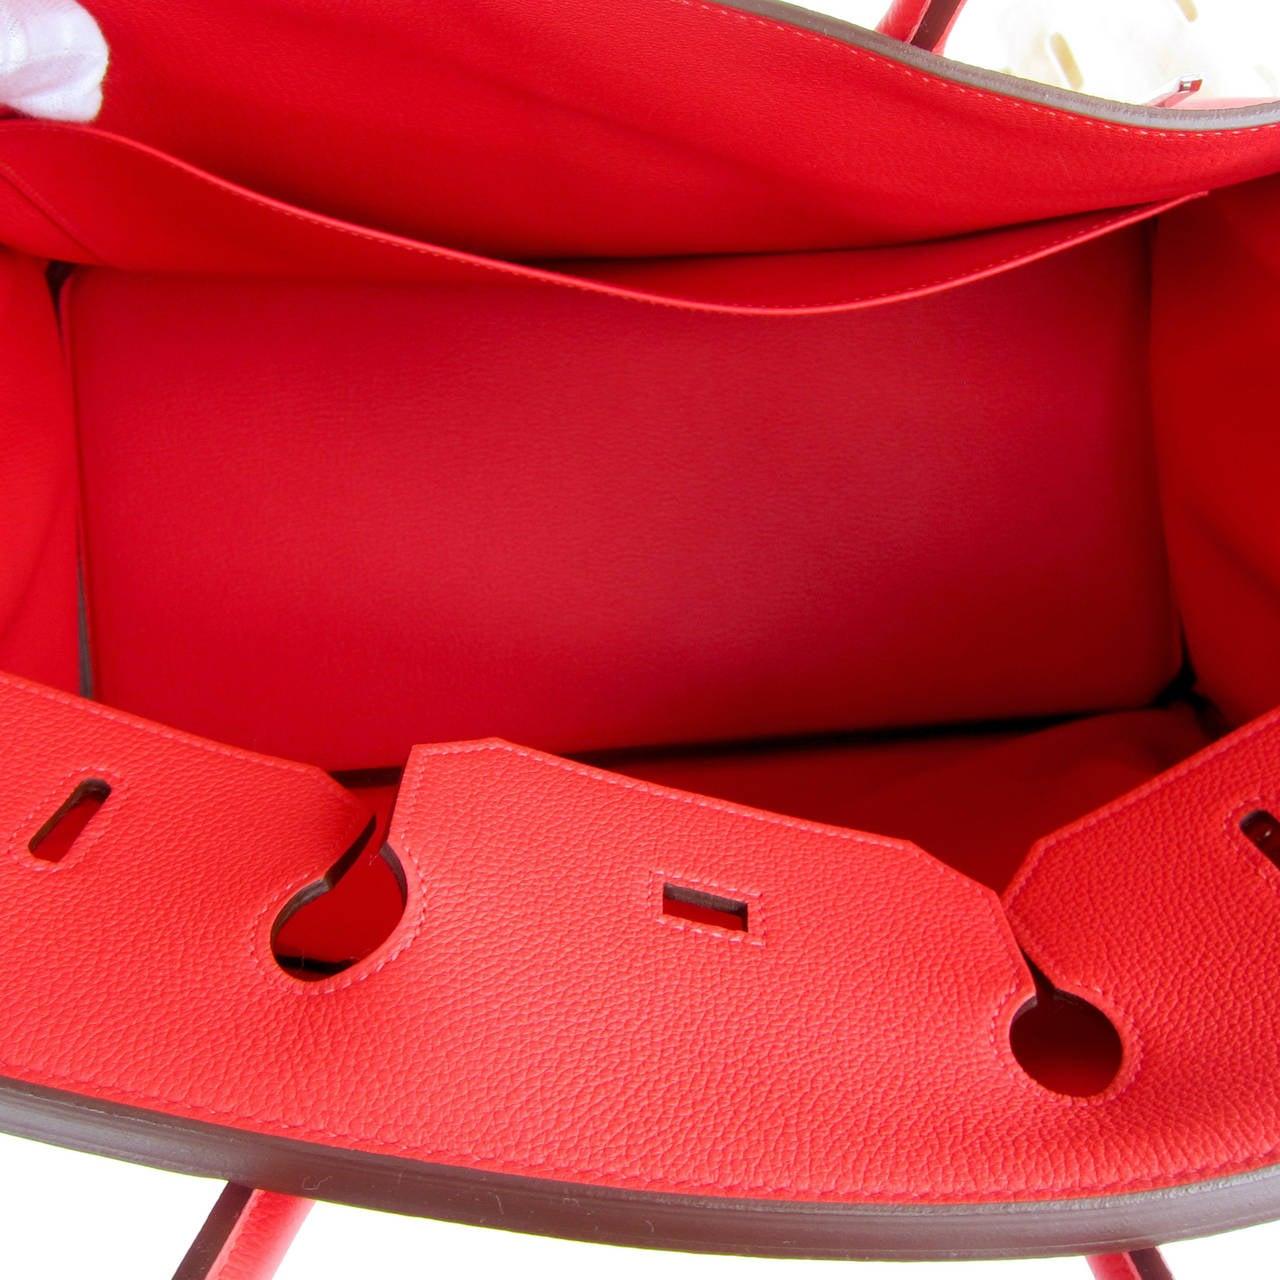 Hermes Rouge Pivoine 40cm Togo Birkin Bag Palladium Luscious For Sale 3